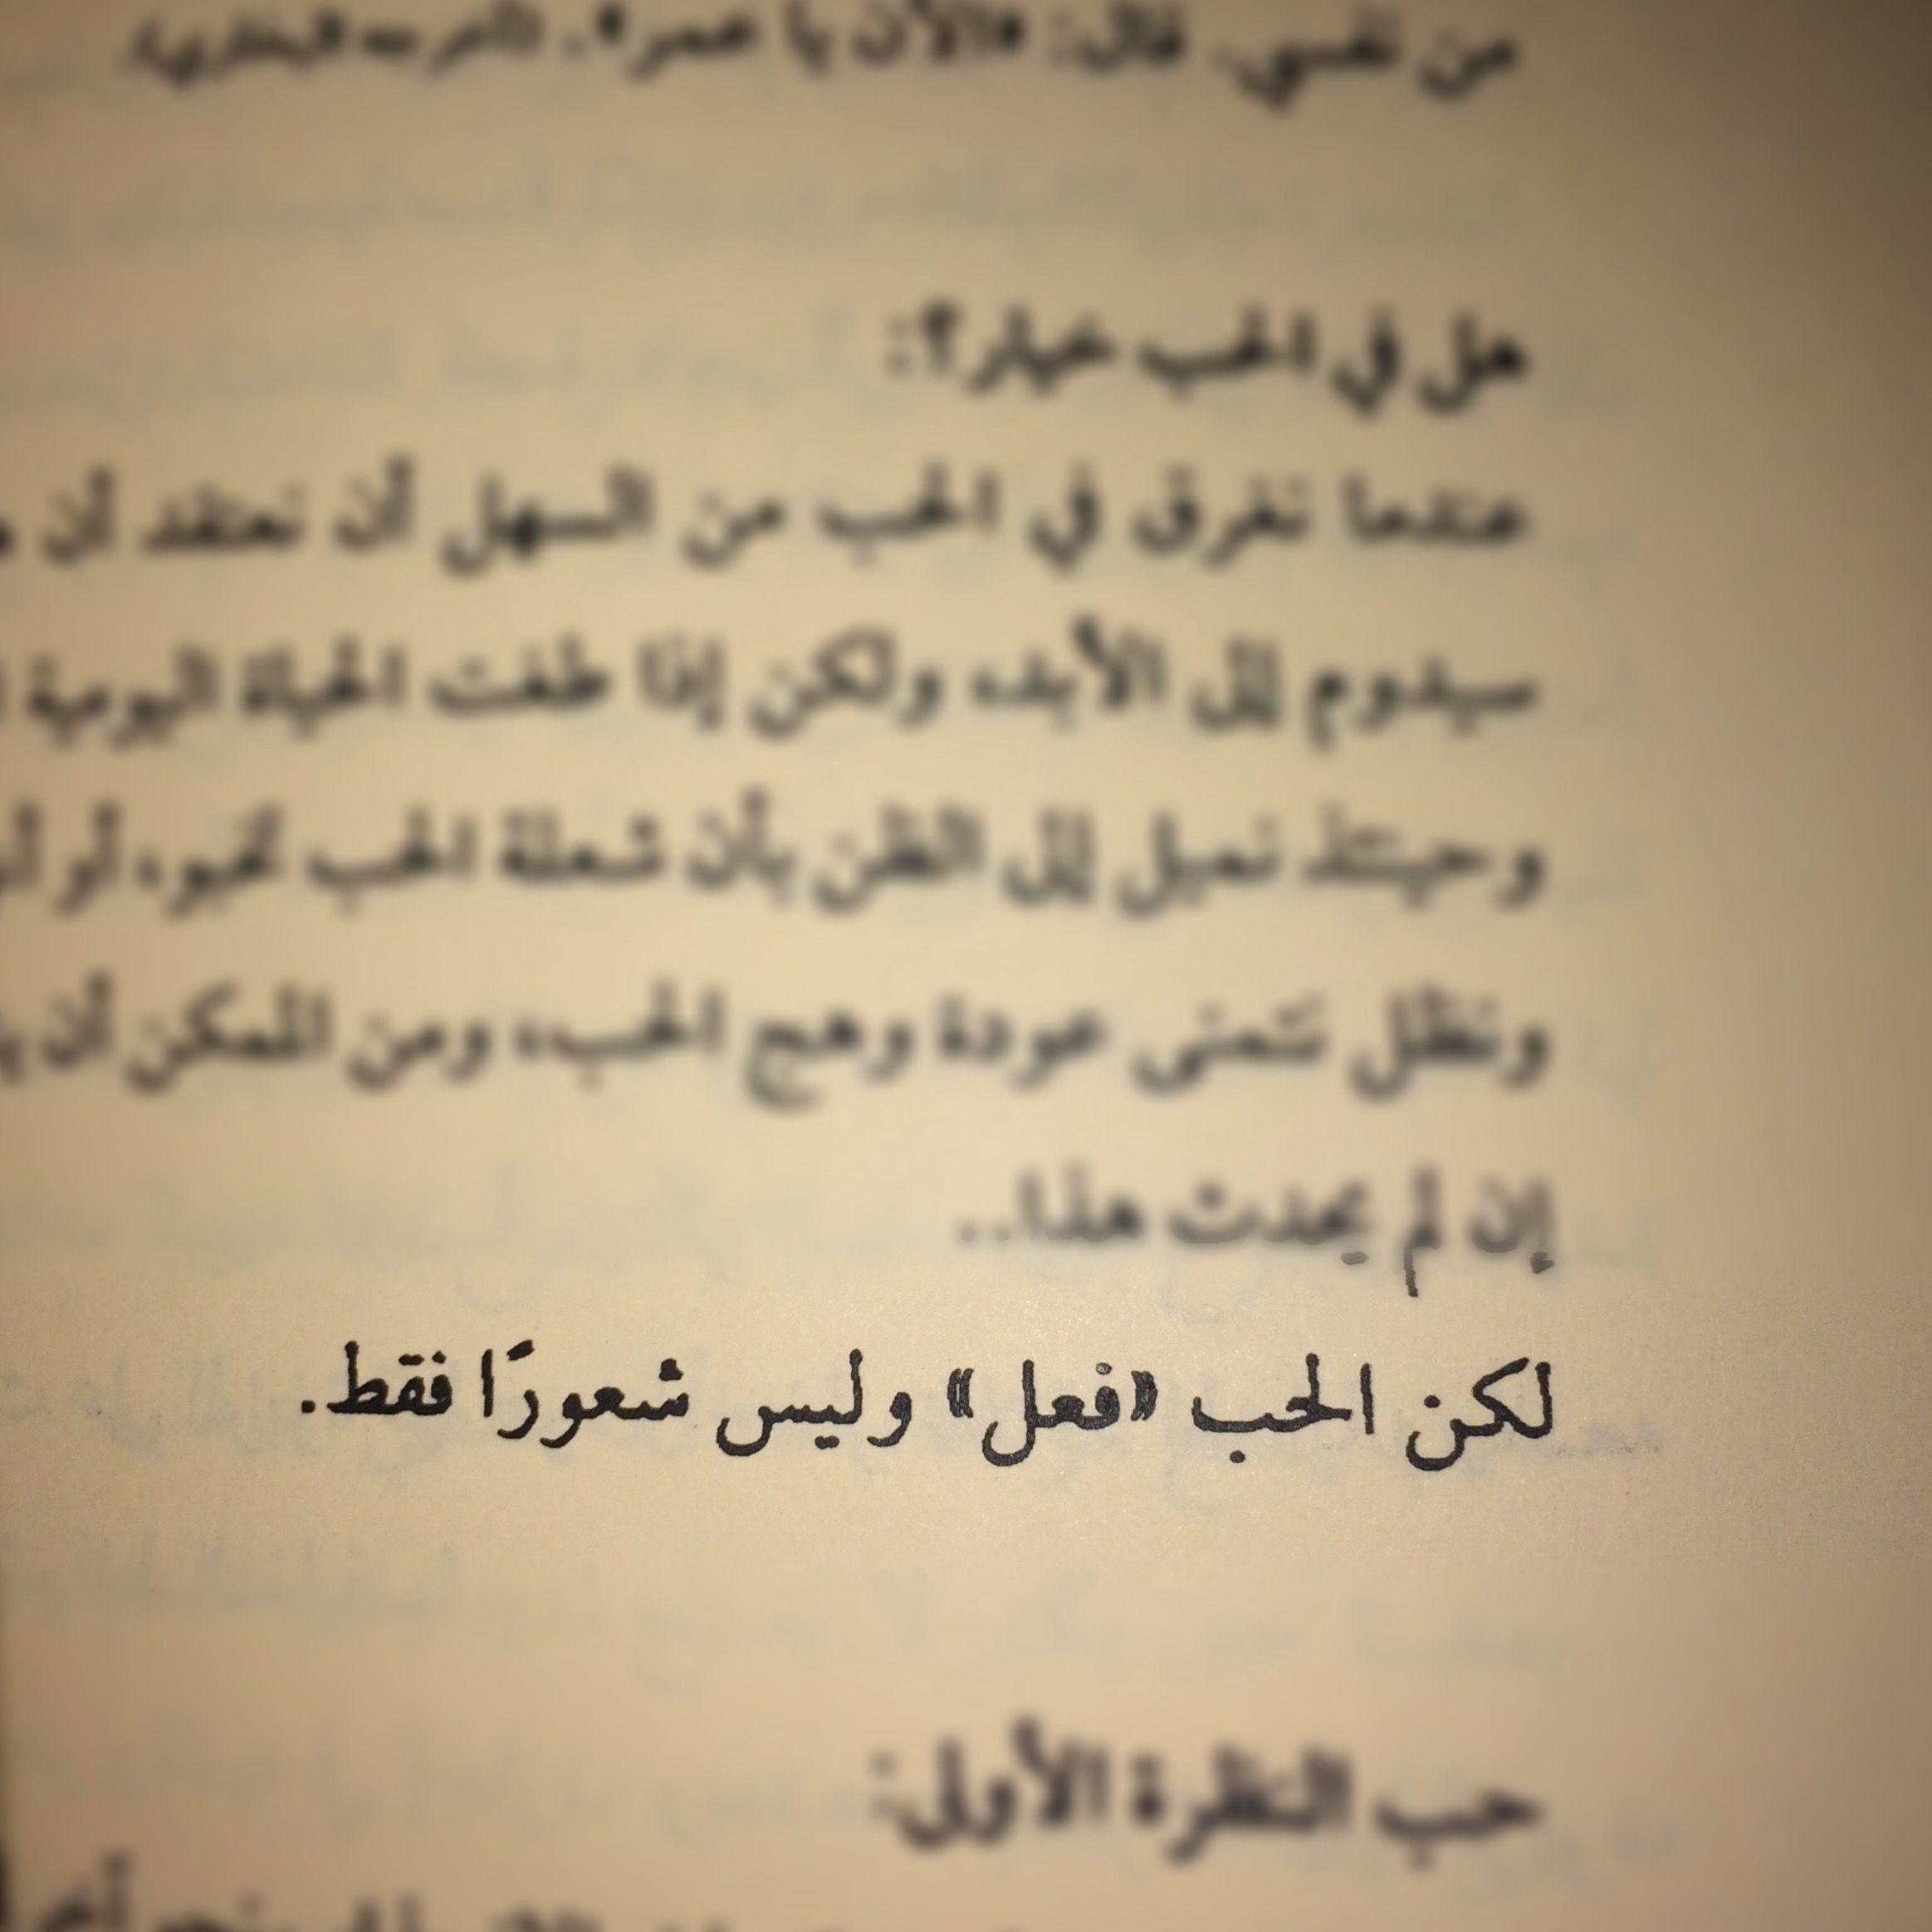 من كتاب انا واخواتها سلمان العودة Calligraphy Arabic Calligraphy